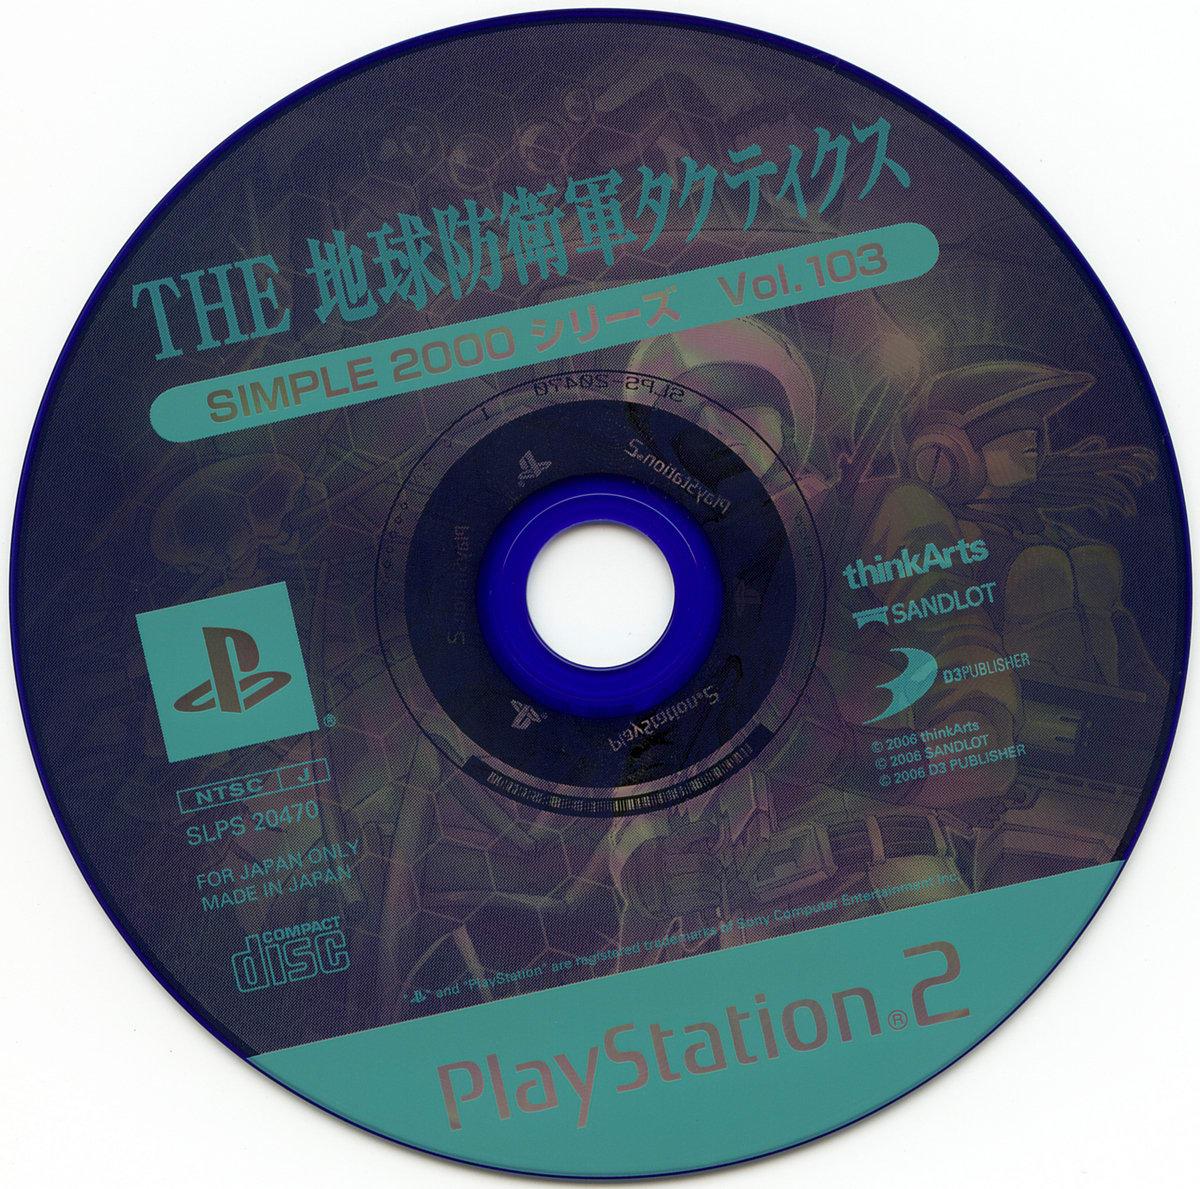 SIMPLE 2000 シリーズ Vol.103 THE 地球防衛軍タクティクス - Dirty